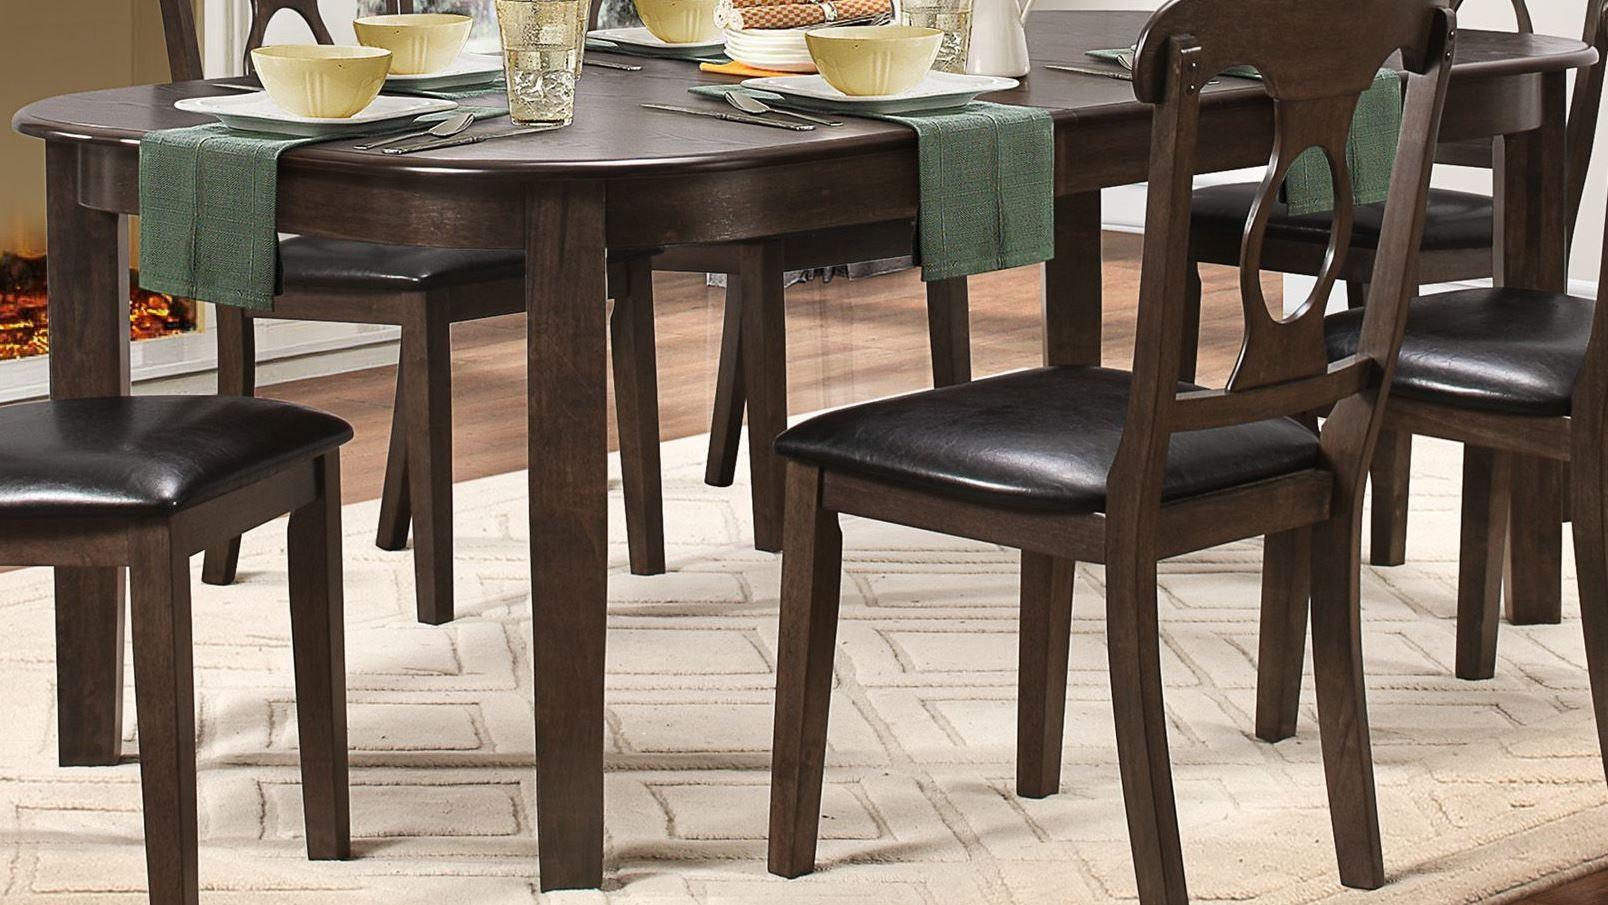 lemoore weathered brown extendable dining room set from homelegance 5144gy coleman furniture. Black Bedroom Furniture Sets. Home Design Ideas